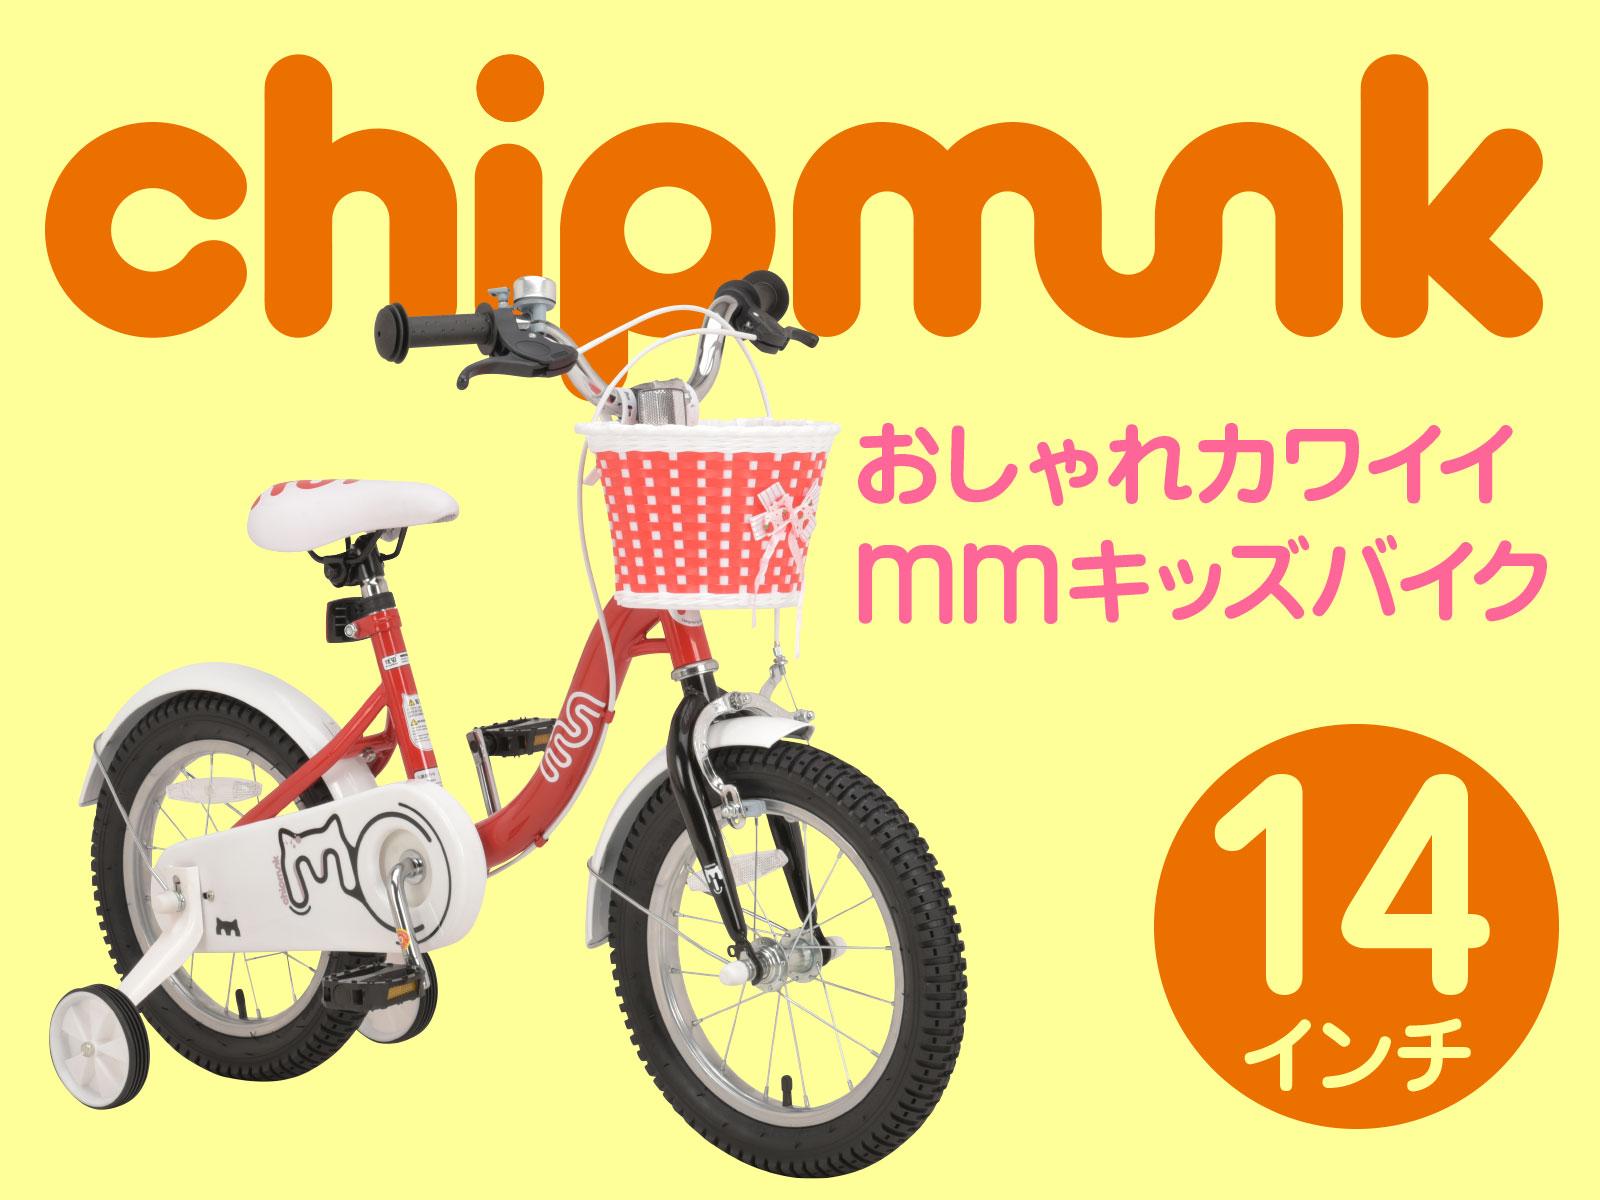 chipmunk_mm14-1